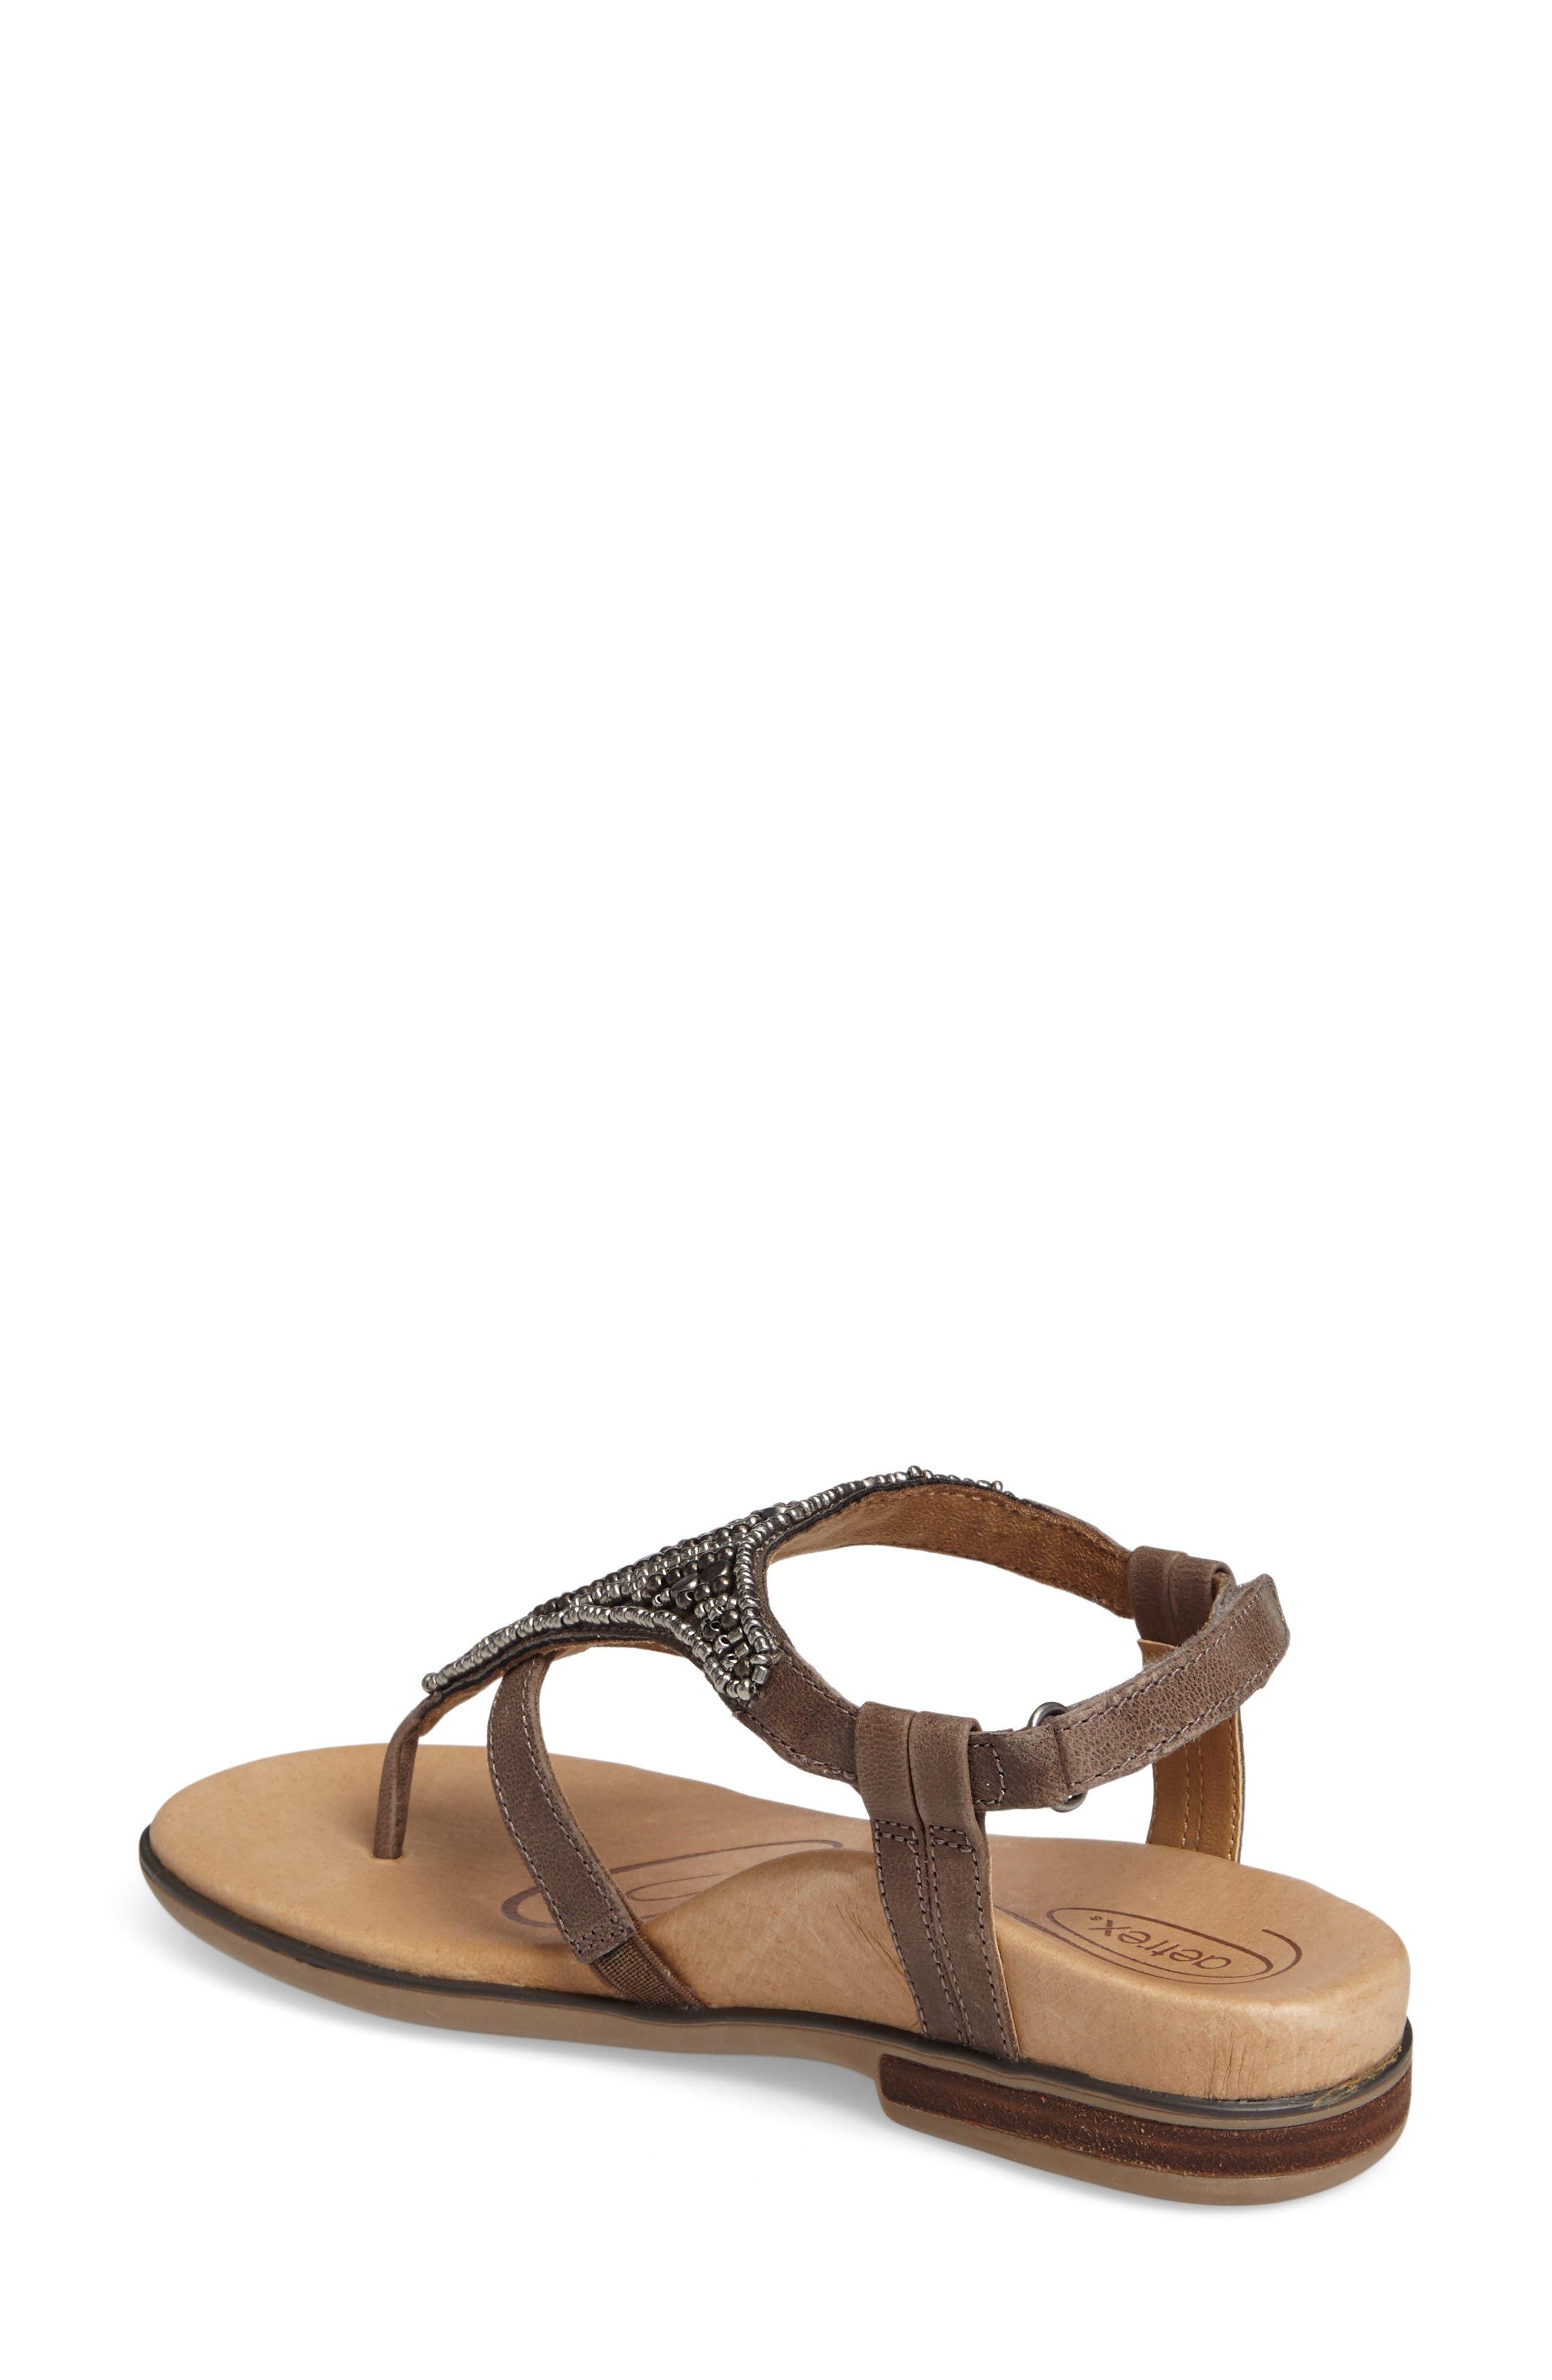 Sheila Embellished Sandal,                             Alternate thumbnail 2, color,                             Stone Leather